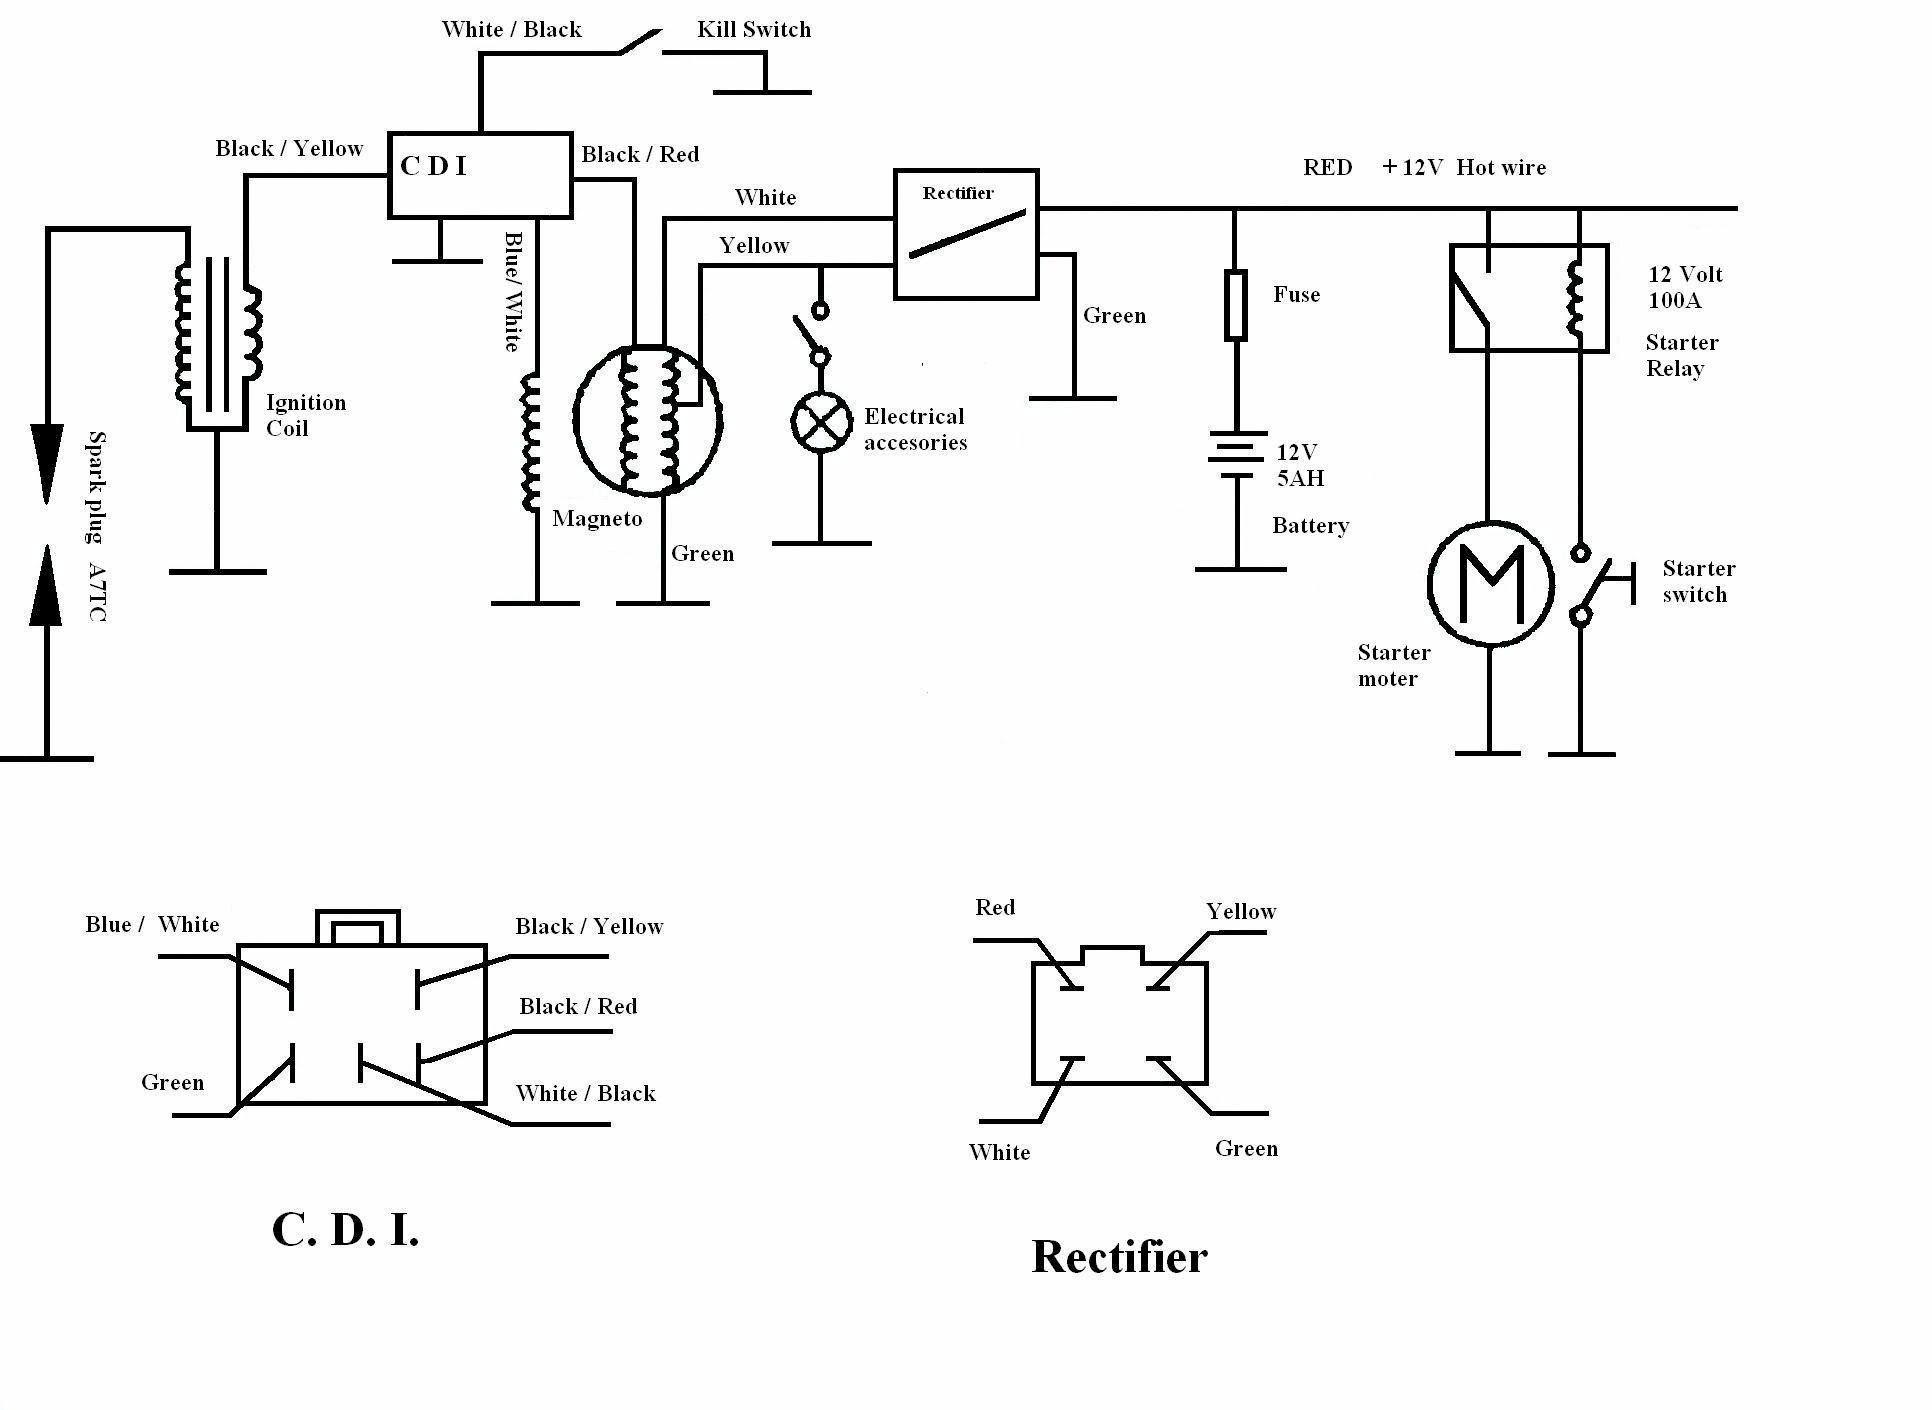 Lifan Wiring Diagram 124 3cm - Electric Ezgo Wiring Diagram 2005 -  light-switch.1997wir.jeanjaures37.frWiring Diagram Resource